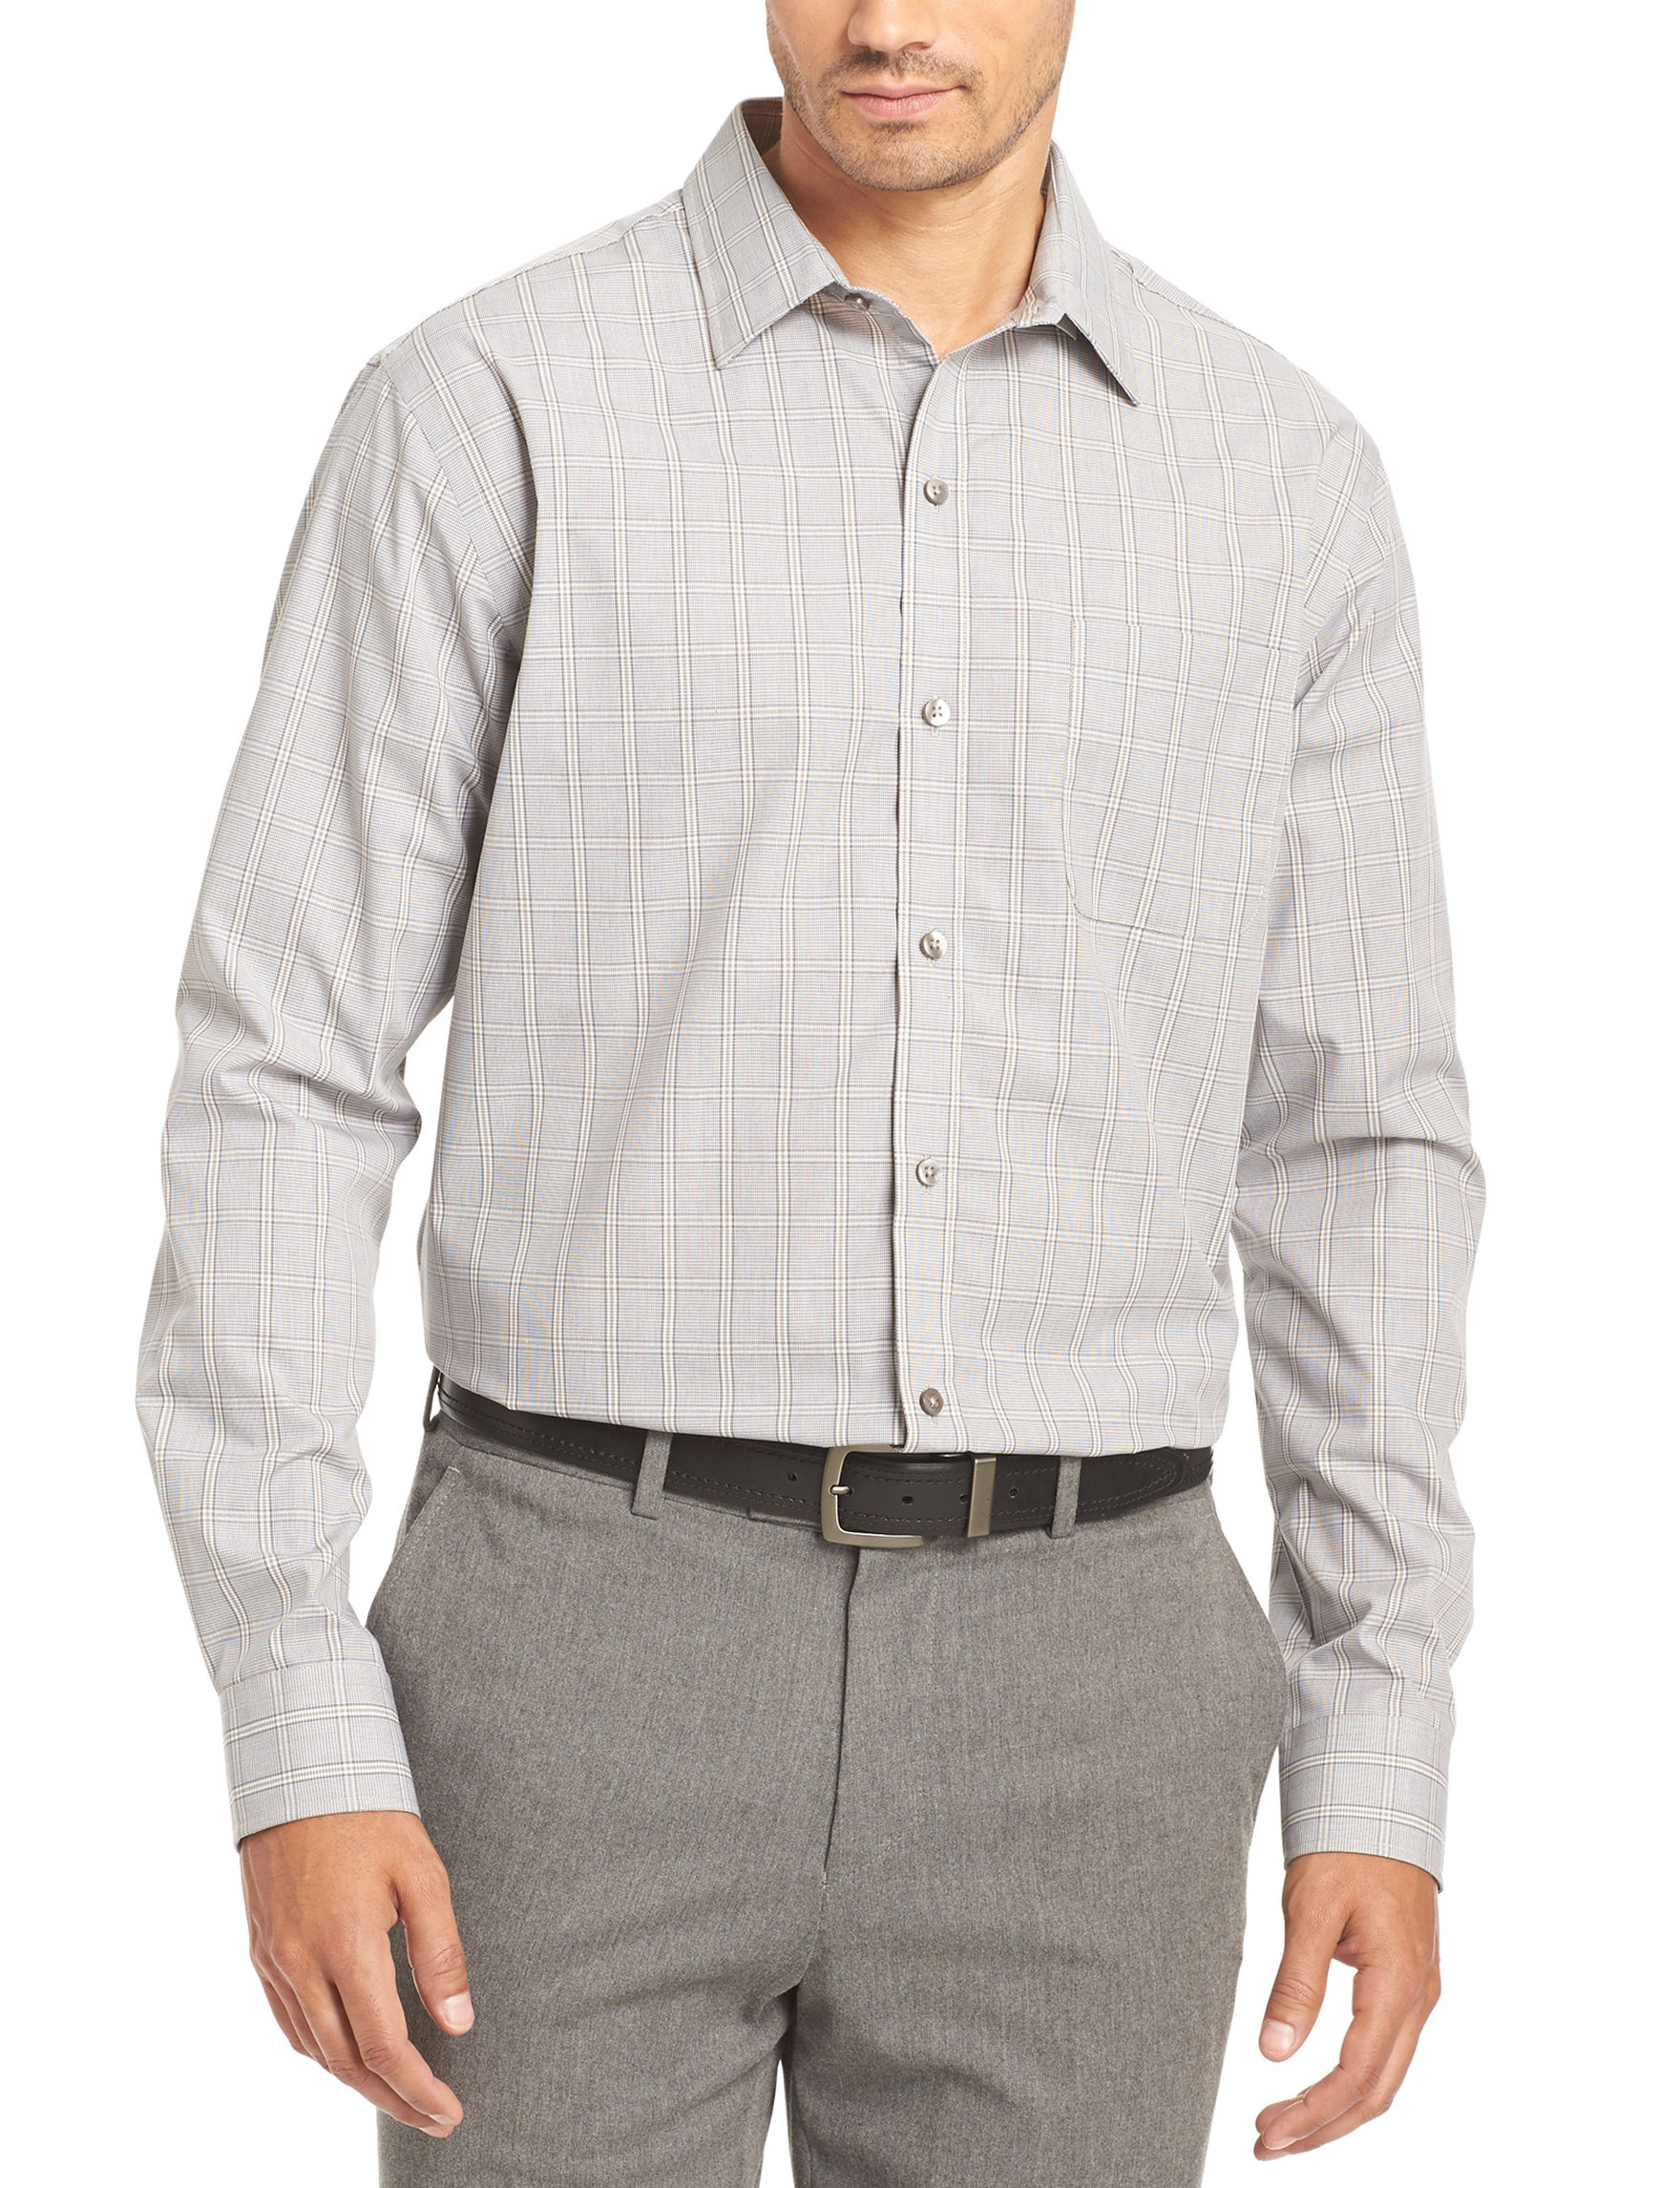 Van heusen glen plaid no iron stretch woven shirt stage for Van heusen plaid shirts